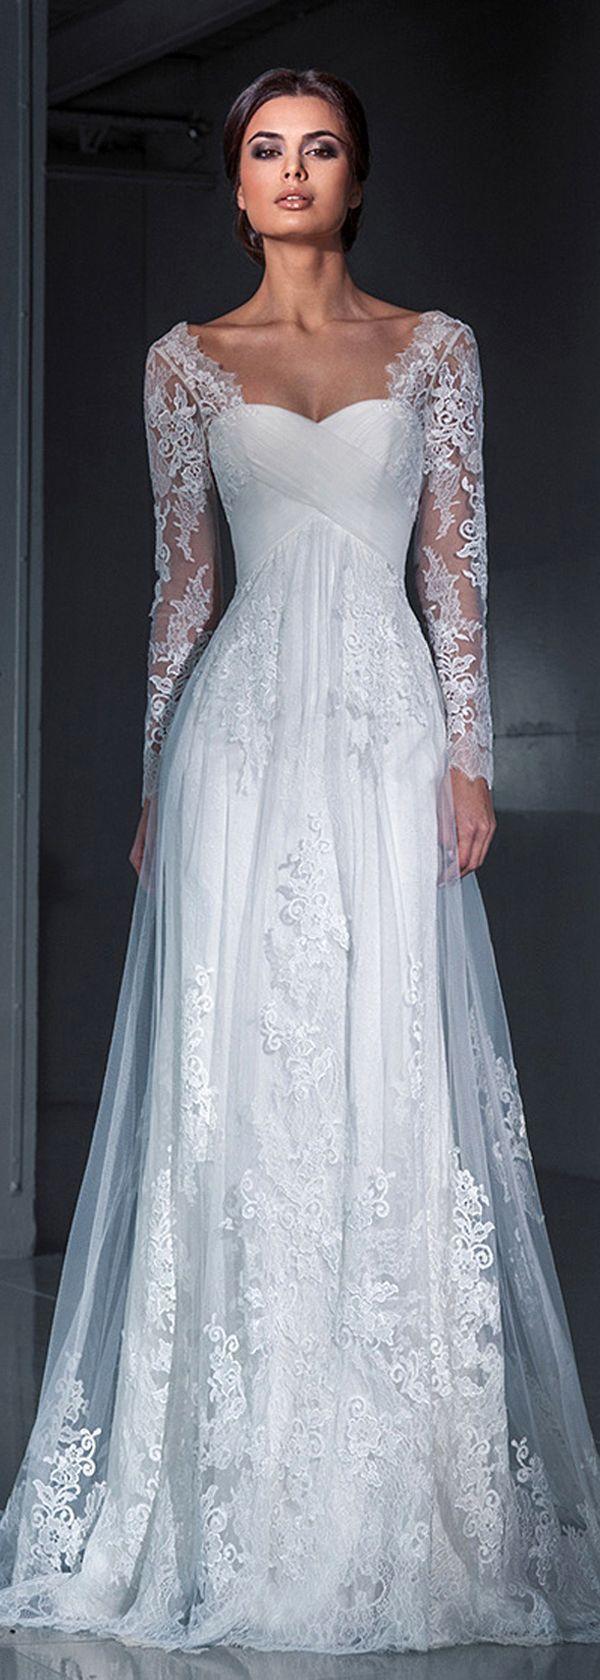 5044 best WEDDING DRESSES images on Pinterest | Wedding dressses ...